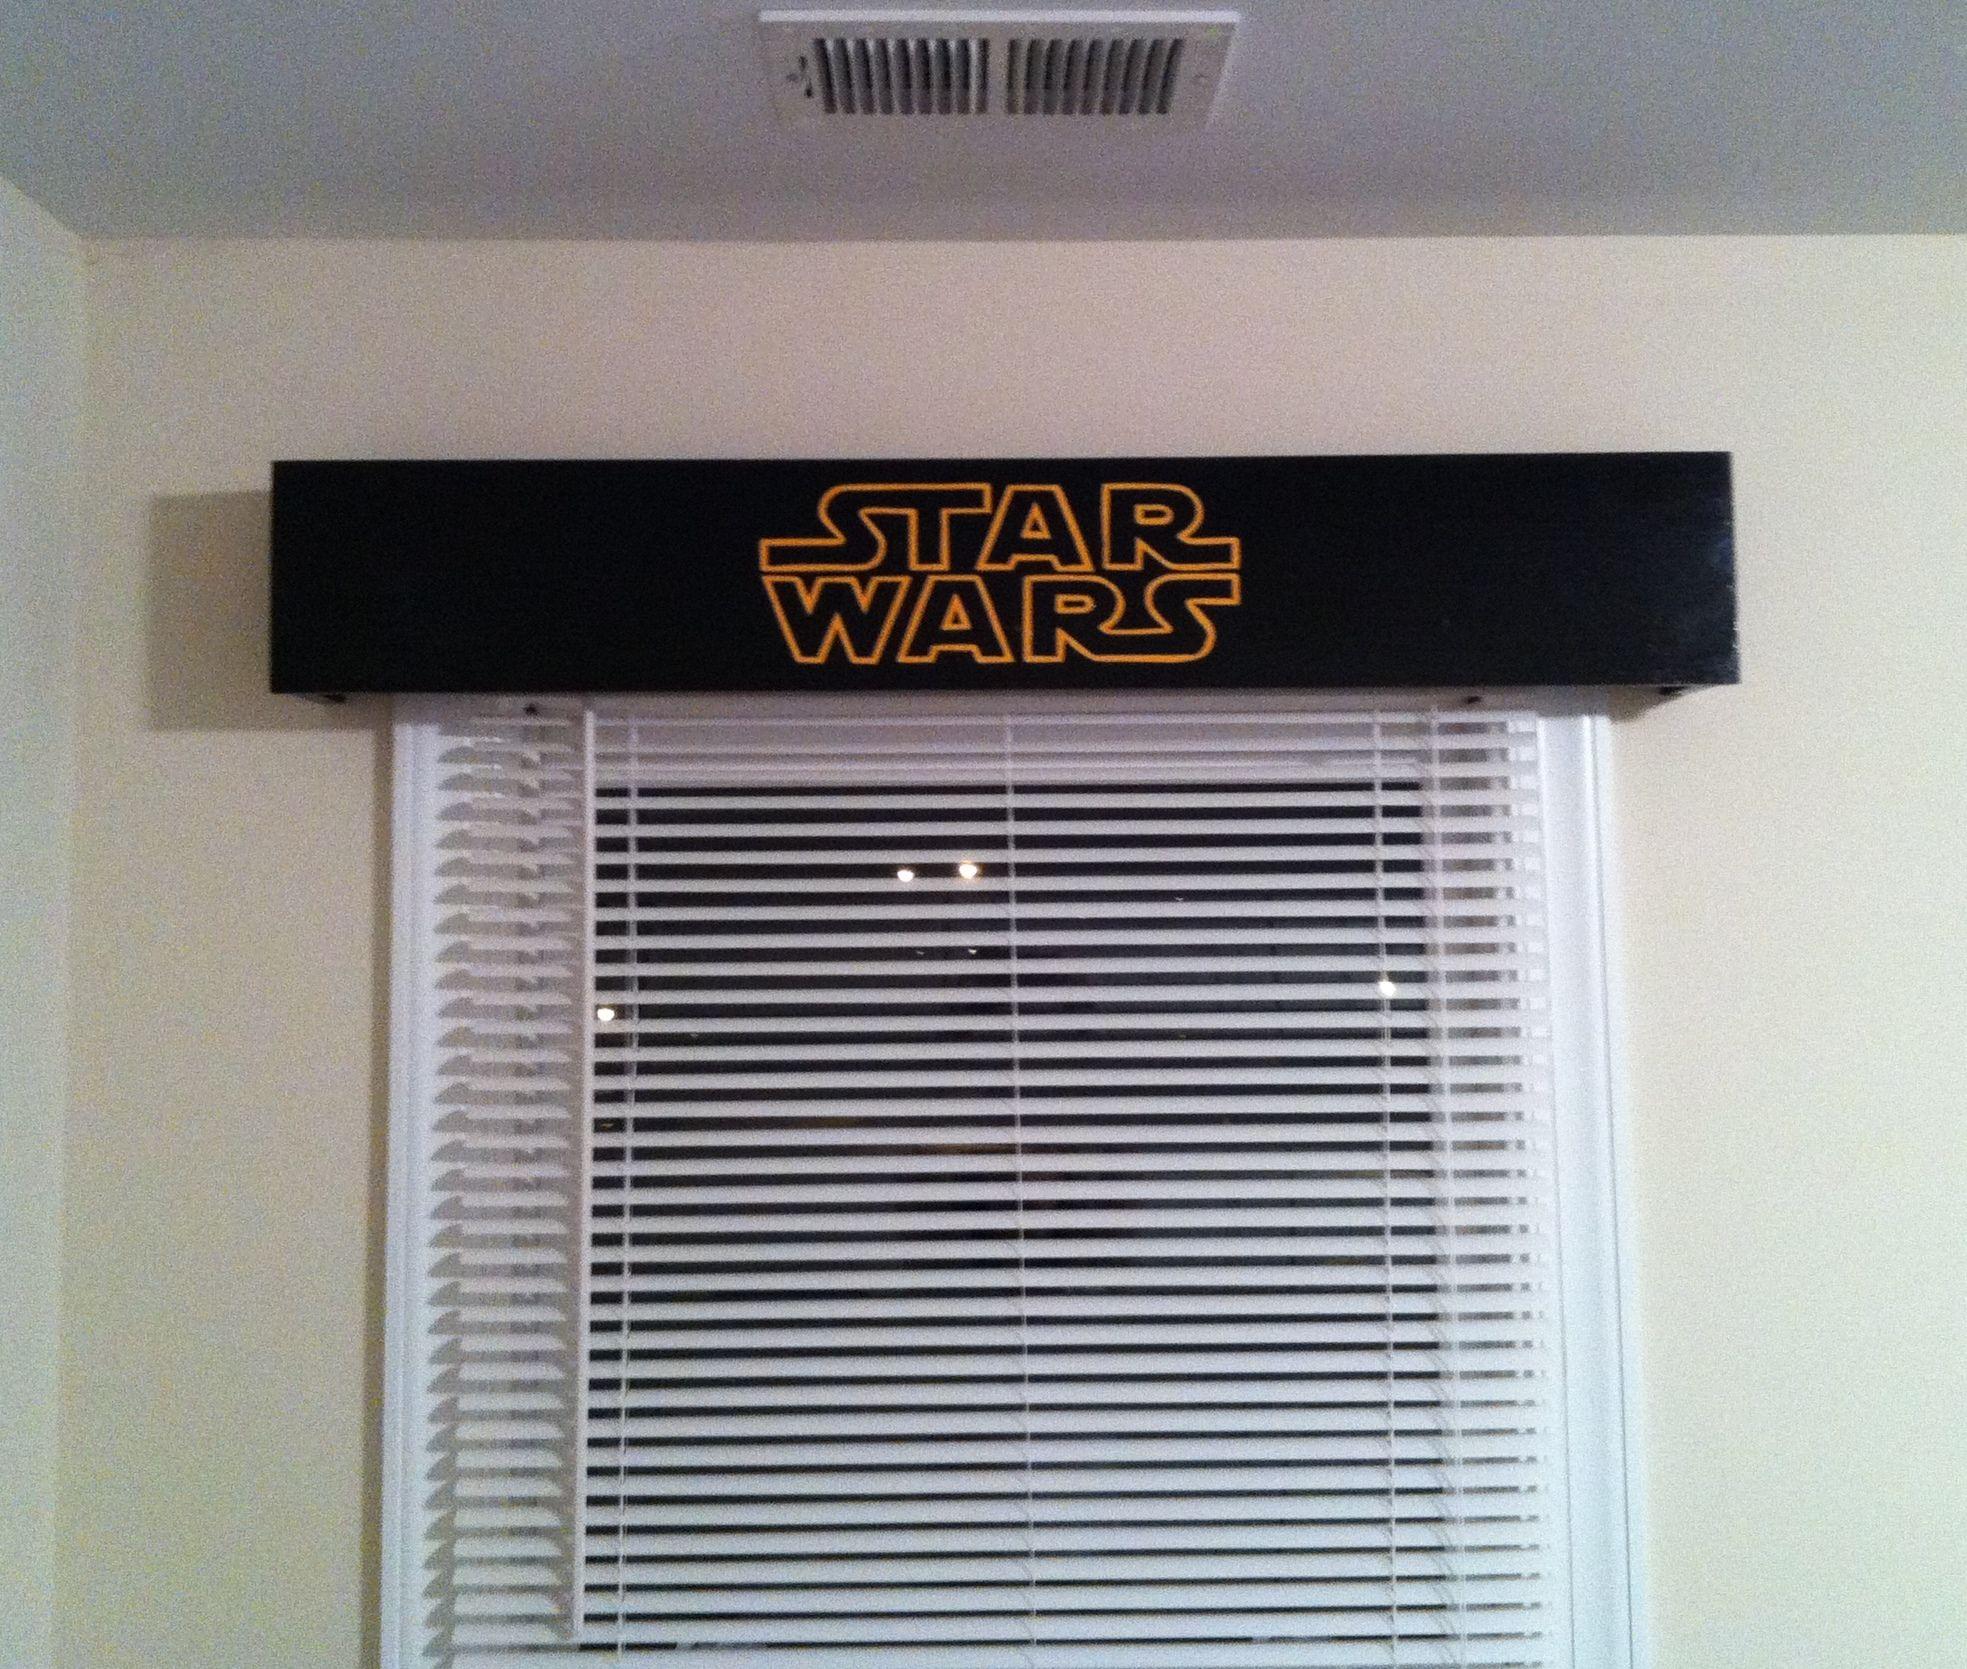 Star wars cornice projects iuve done pinterest cornice